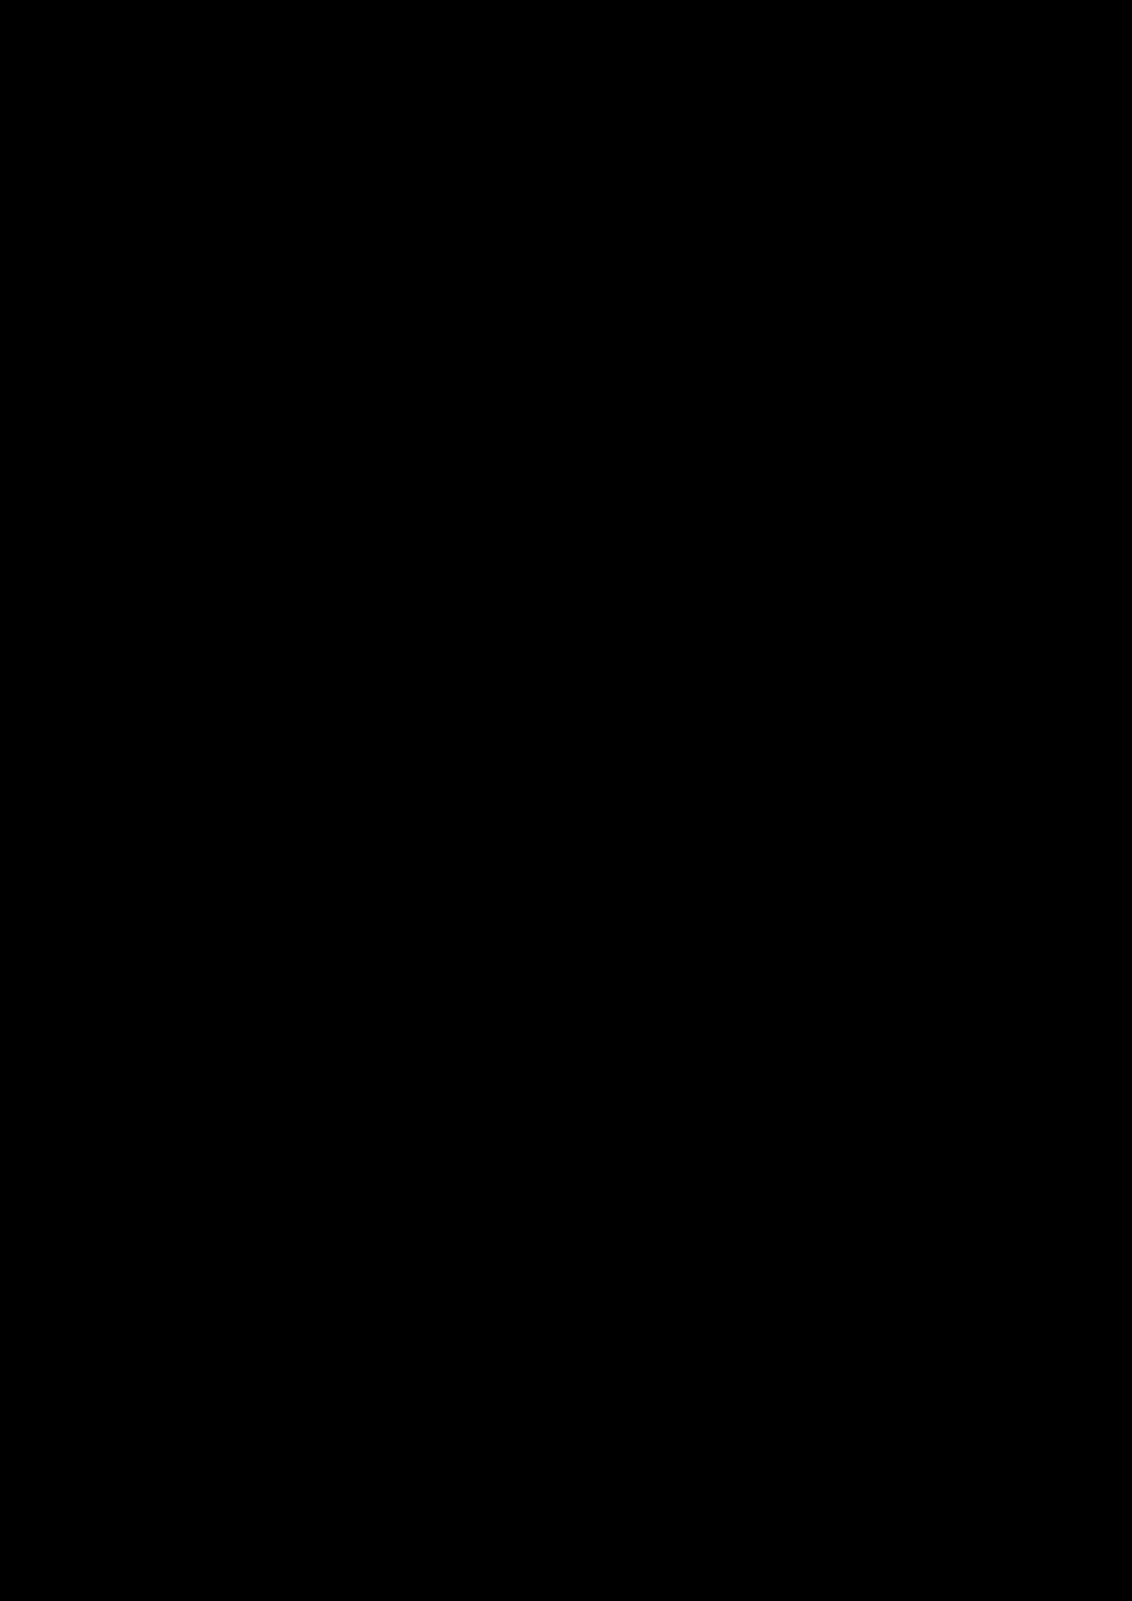 Belyiy sokol slide, Image 46